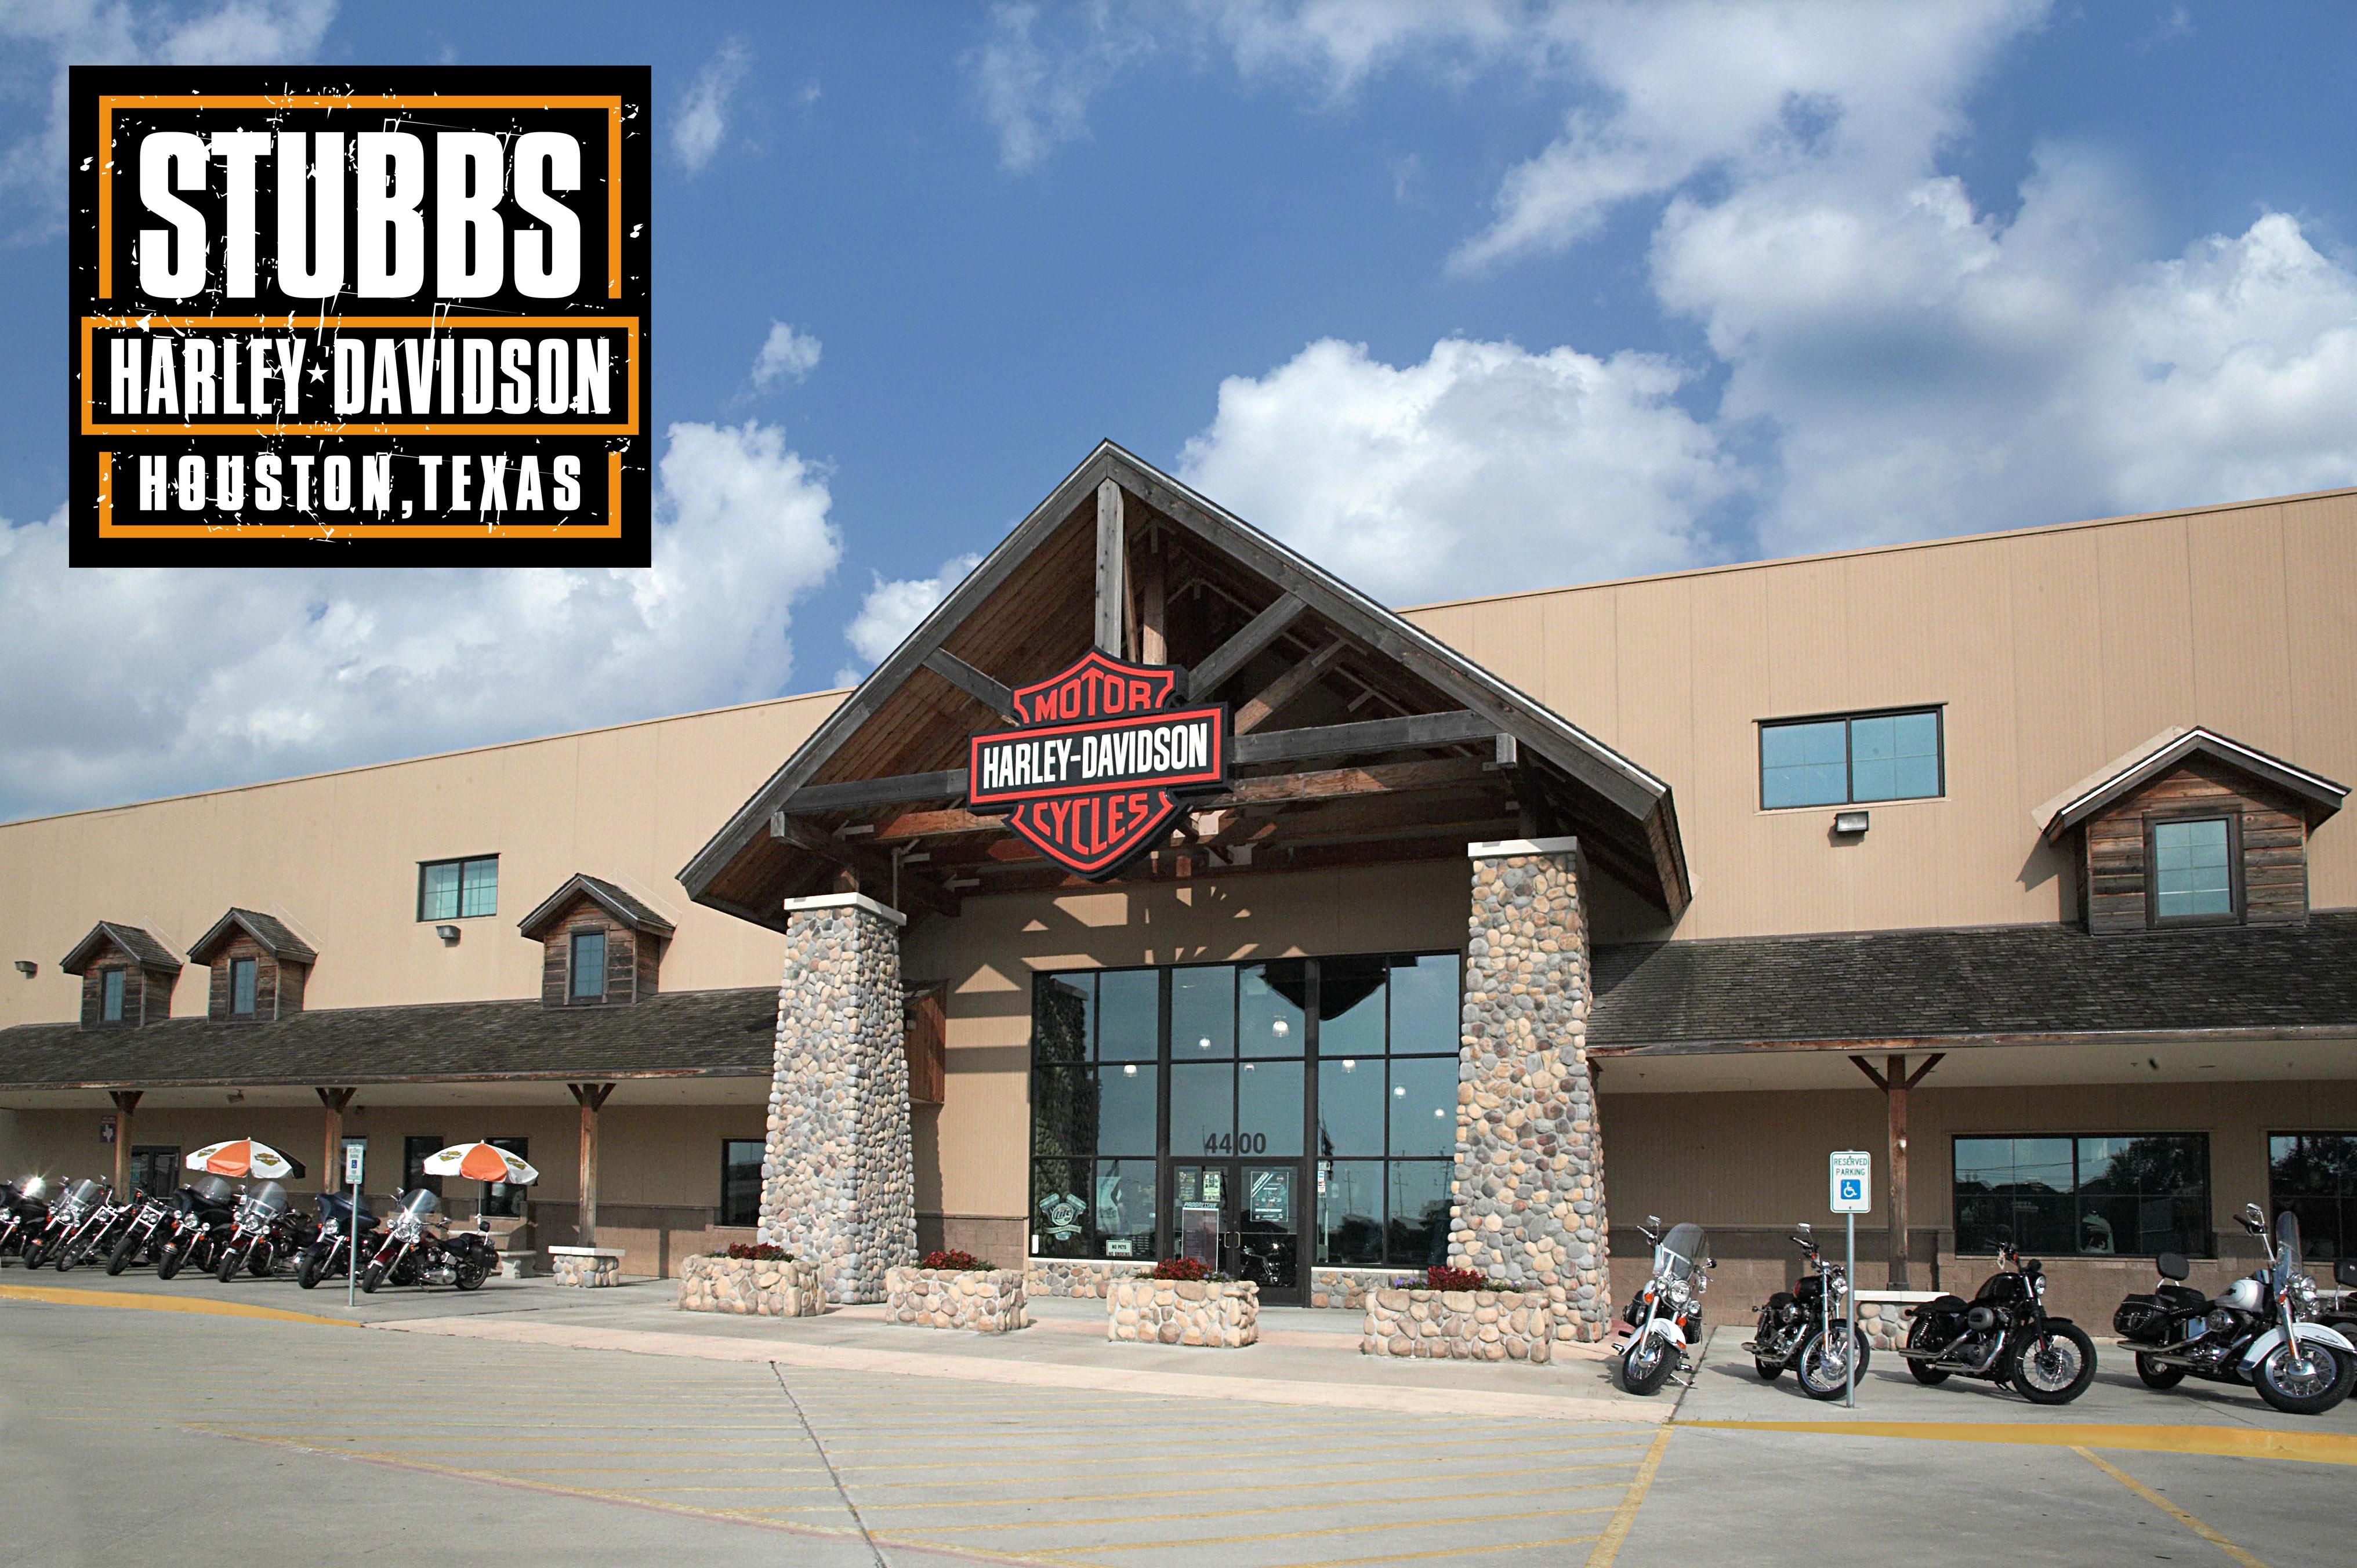 Stubbs Harley-Davidson 4400 Telephone Rd Houston, Tx Motorcycle - Texas Harley Davidson Dealers Map